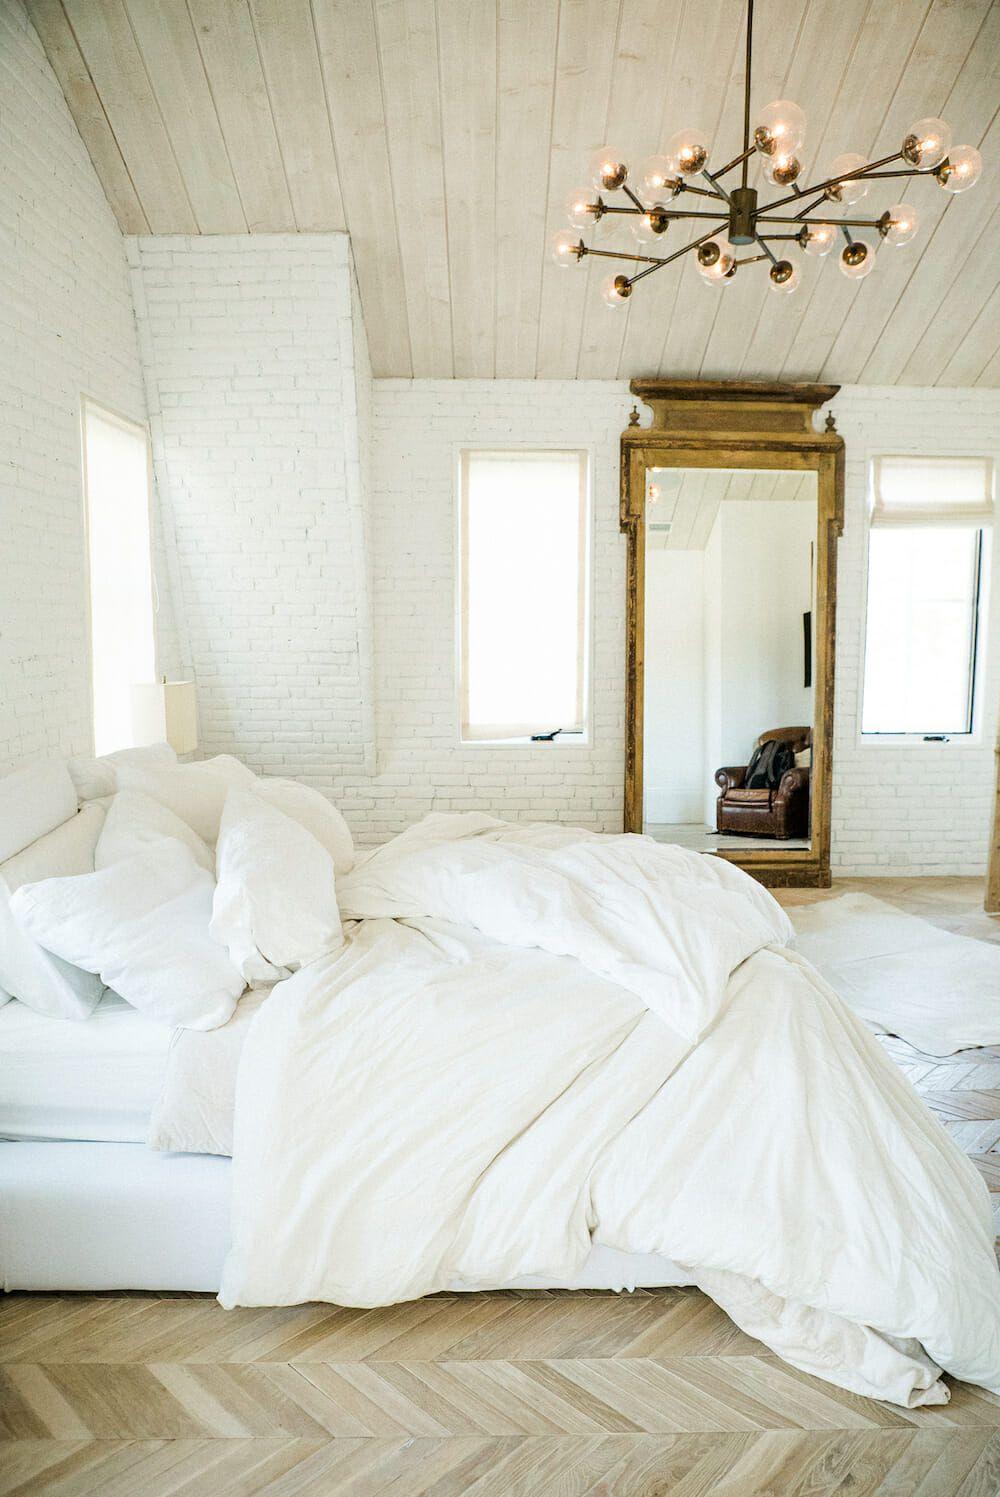 50+ Stylish Bedroom Design Ideas - Modern Bedrooms Decorating Tips